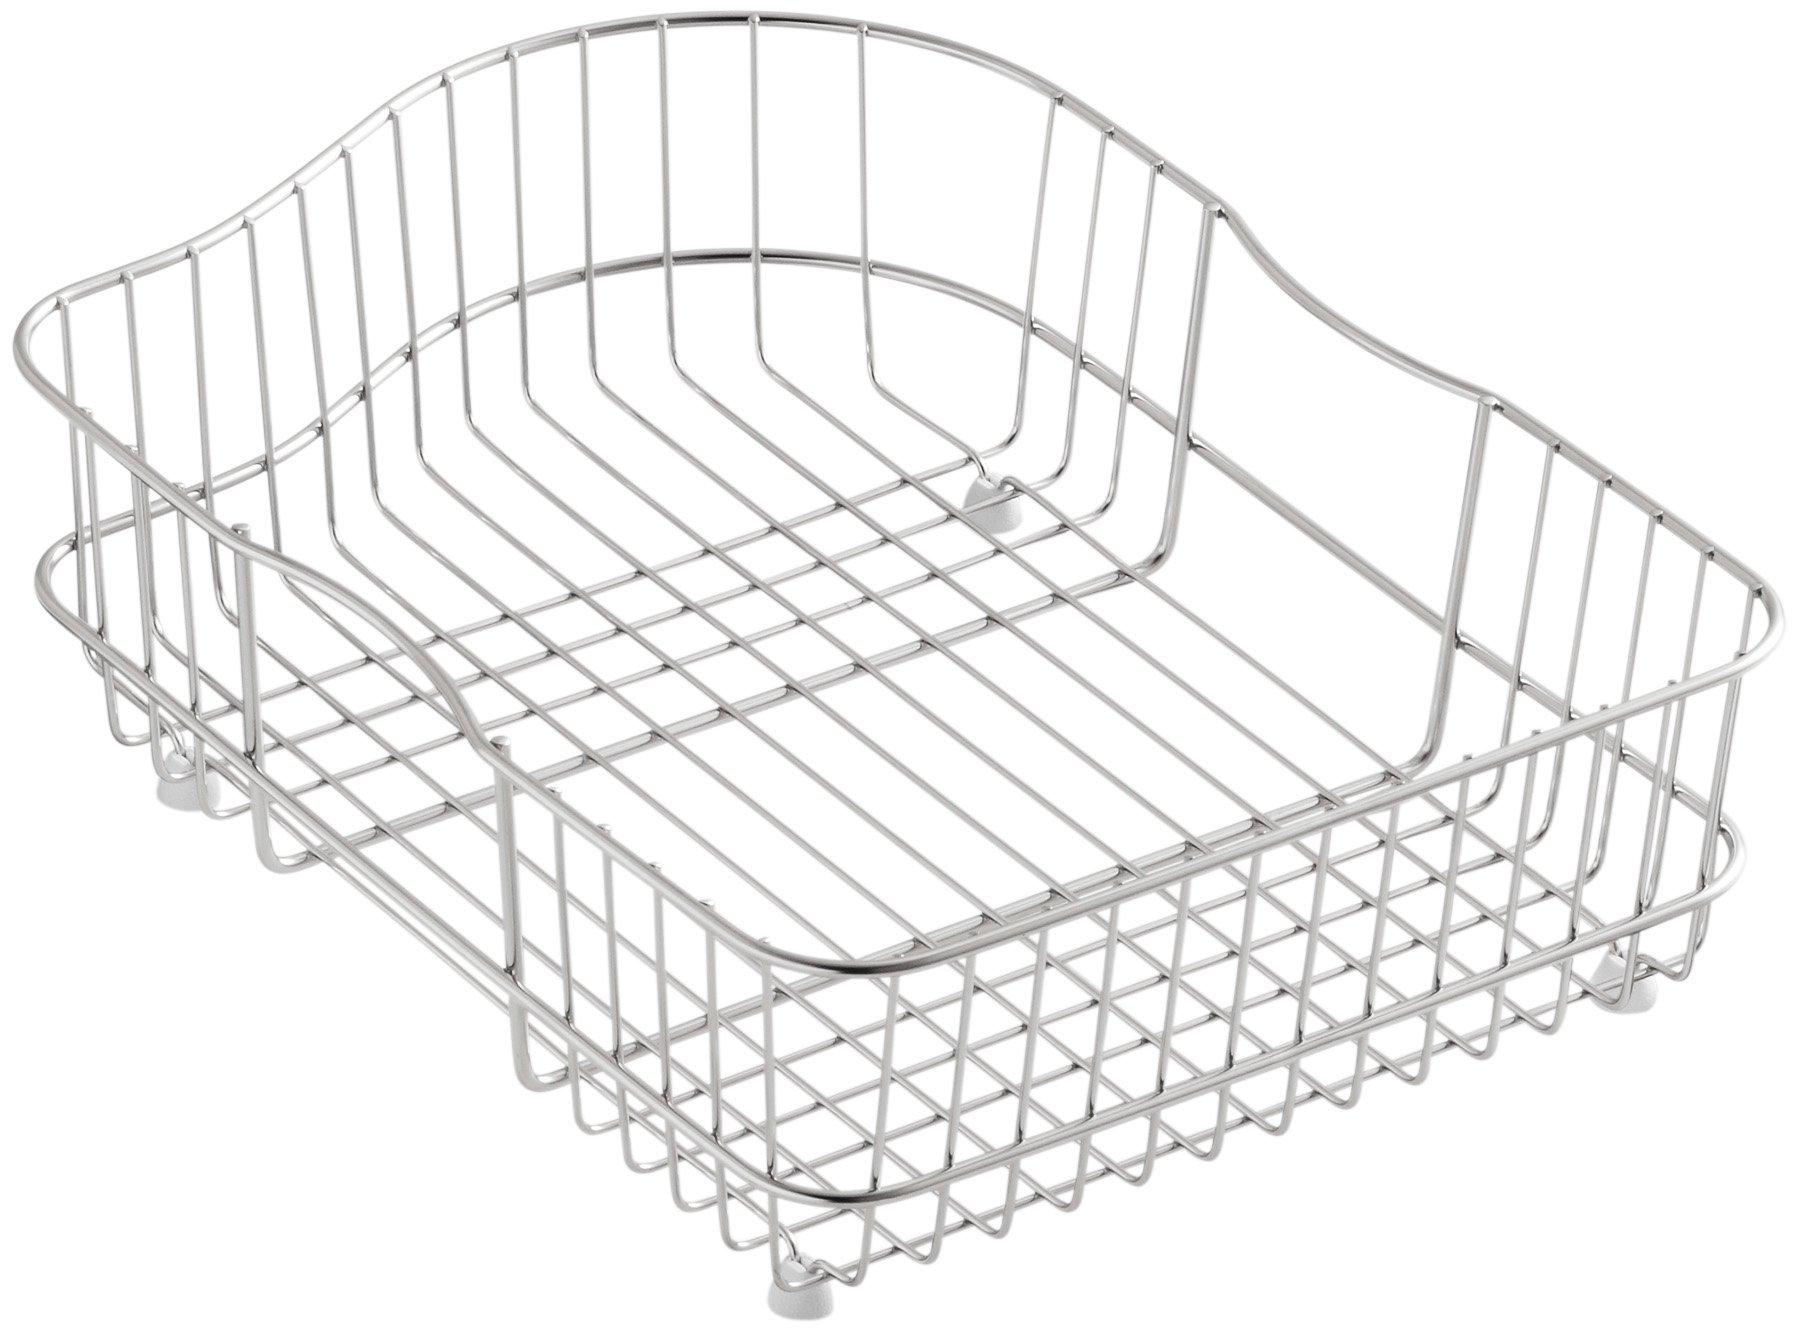 Kohler K-6603R-ST Hartland Wire Rinse Basket, Stainless Steel by Kohler